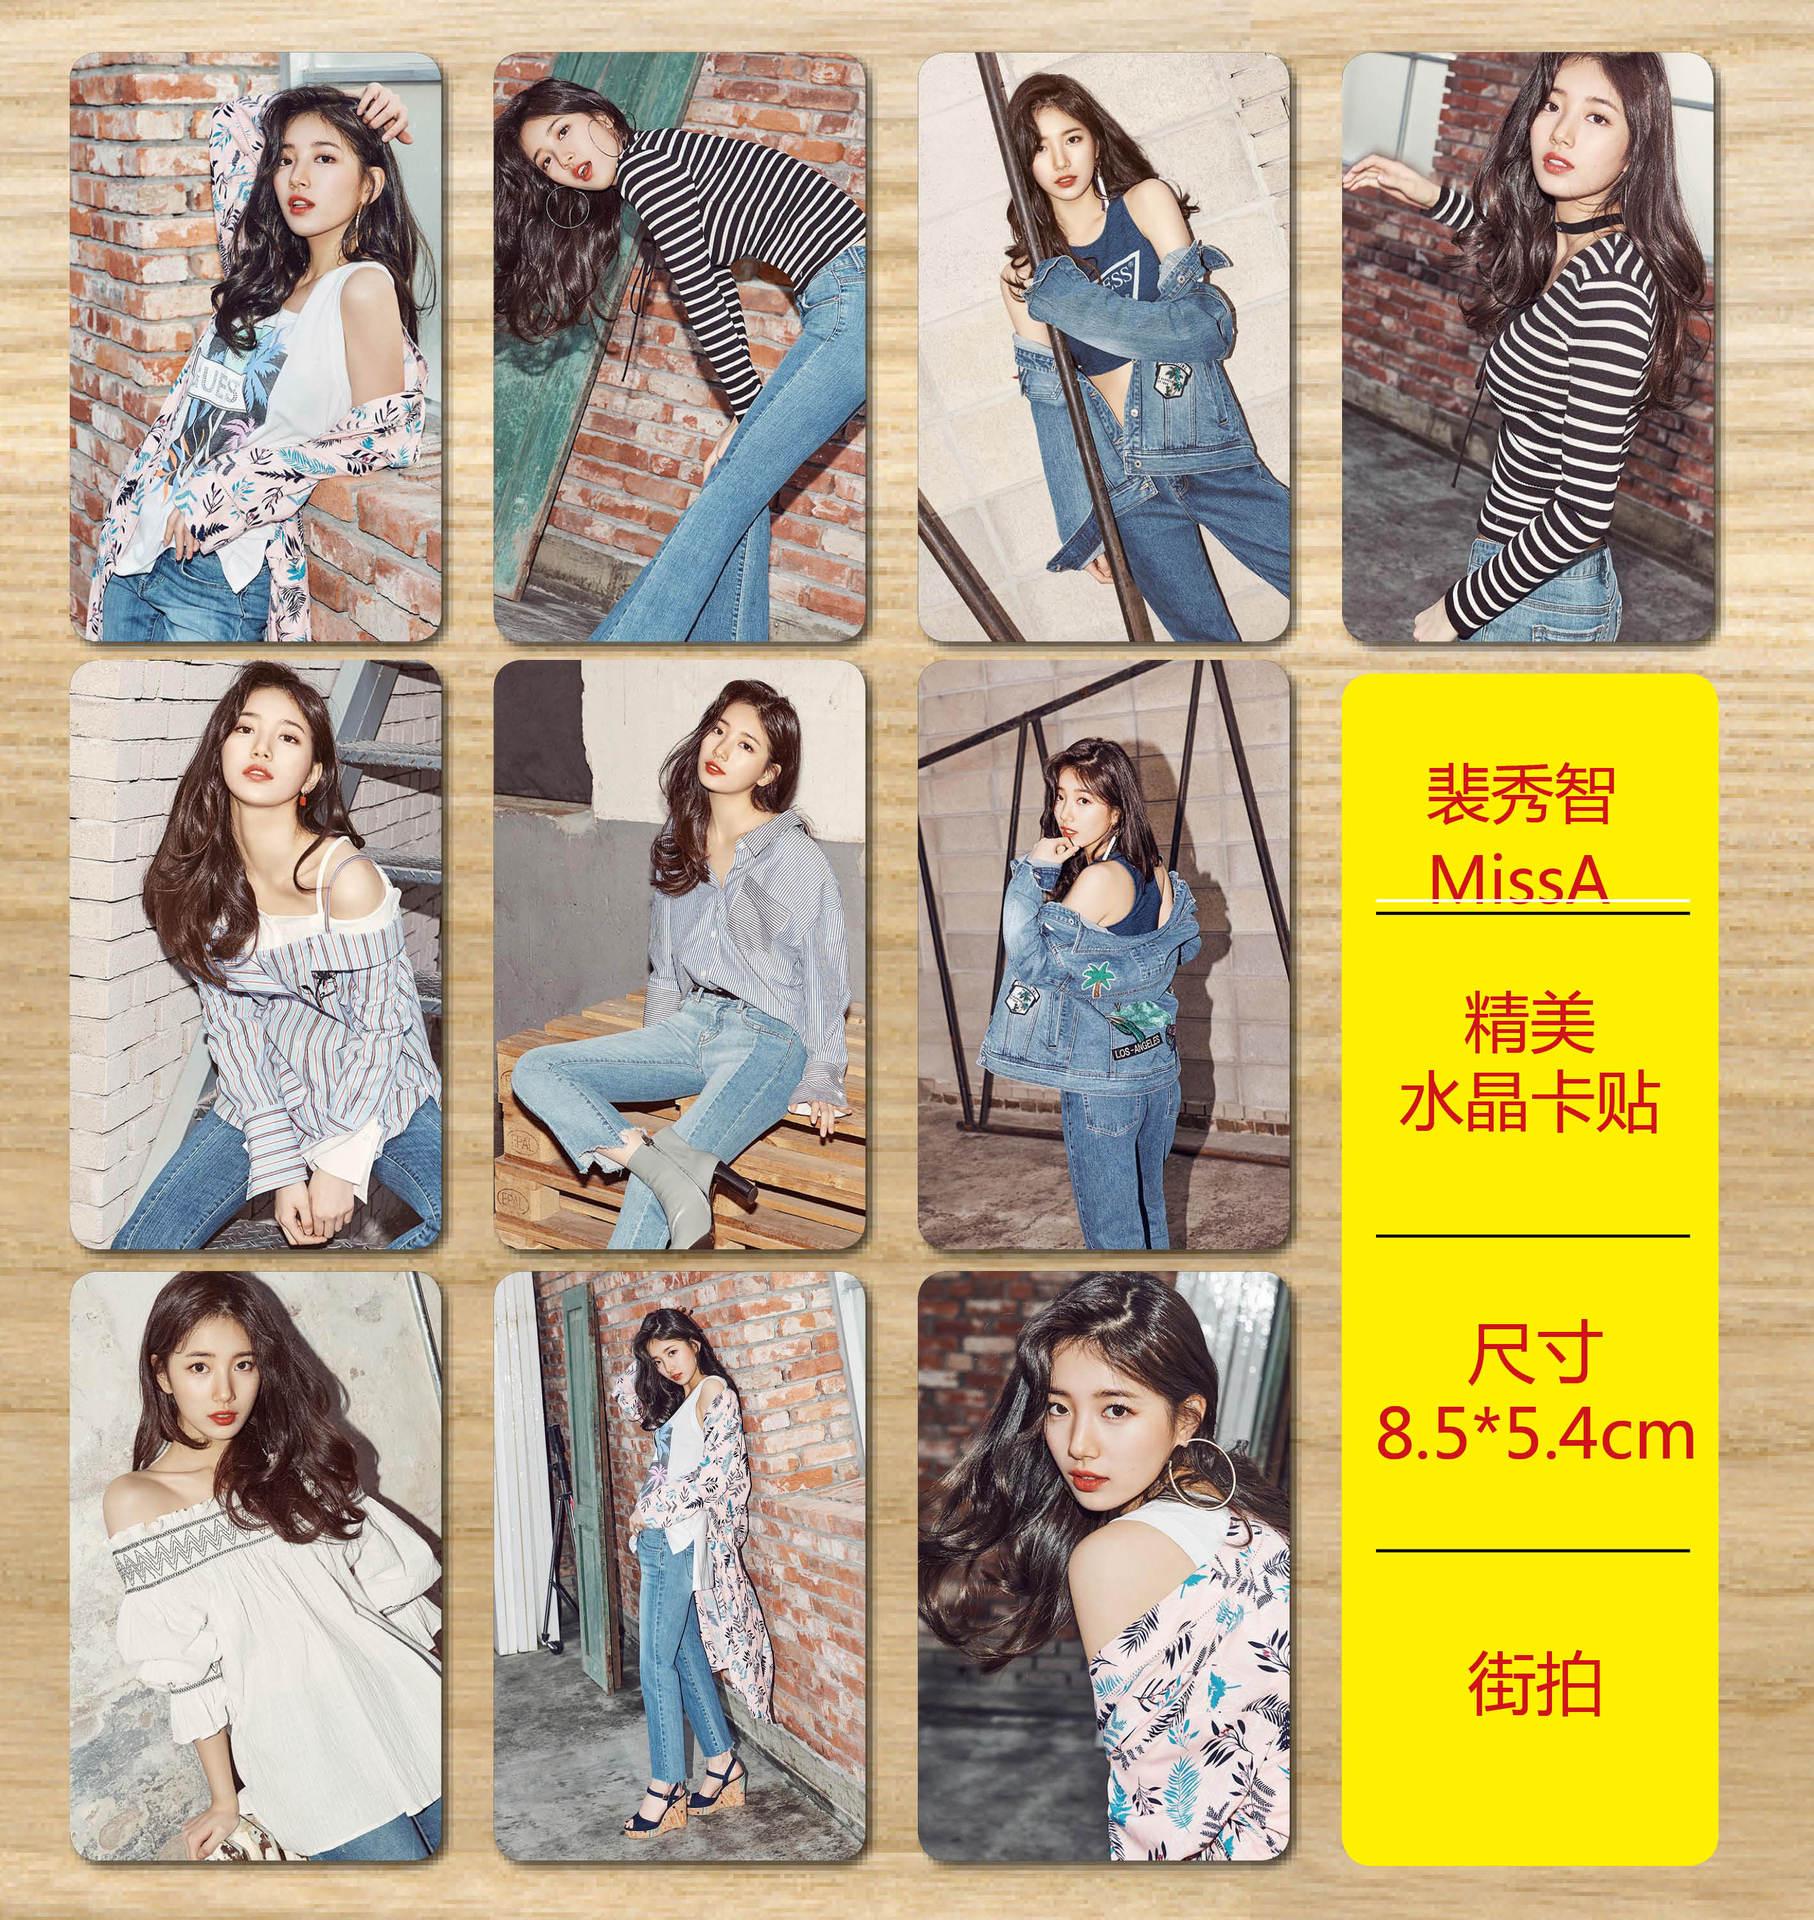 [MYKPOP]MissA SUZY BAE A Photo Album Crystal Sticker KPOP Fans Items 10pcs/set SA18041906